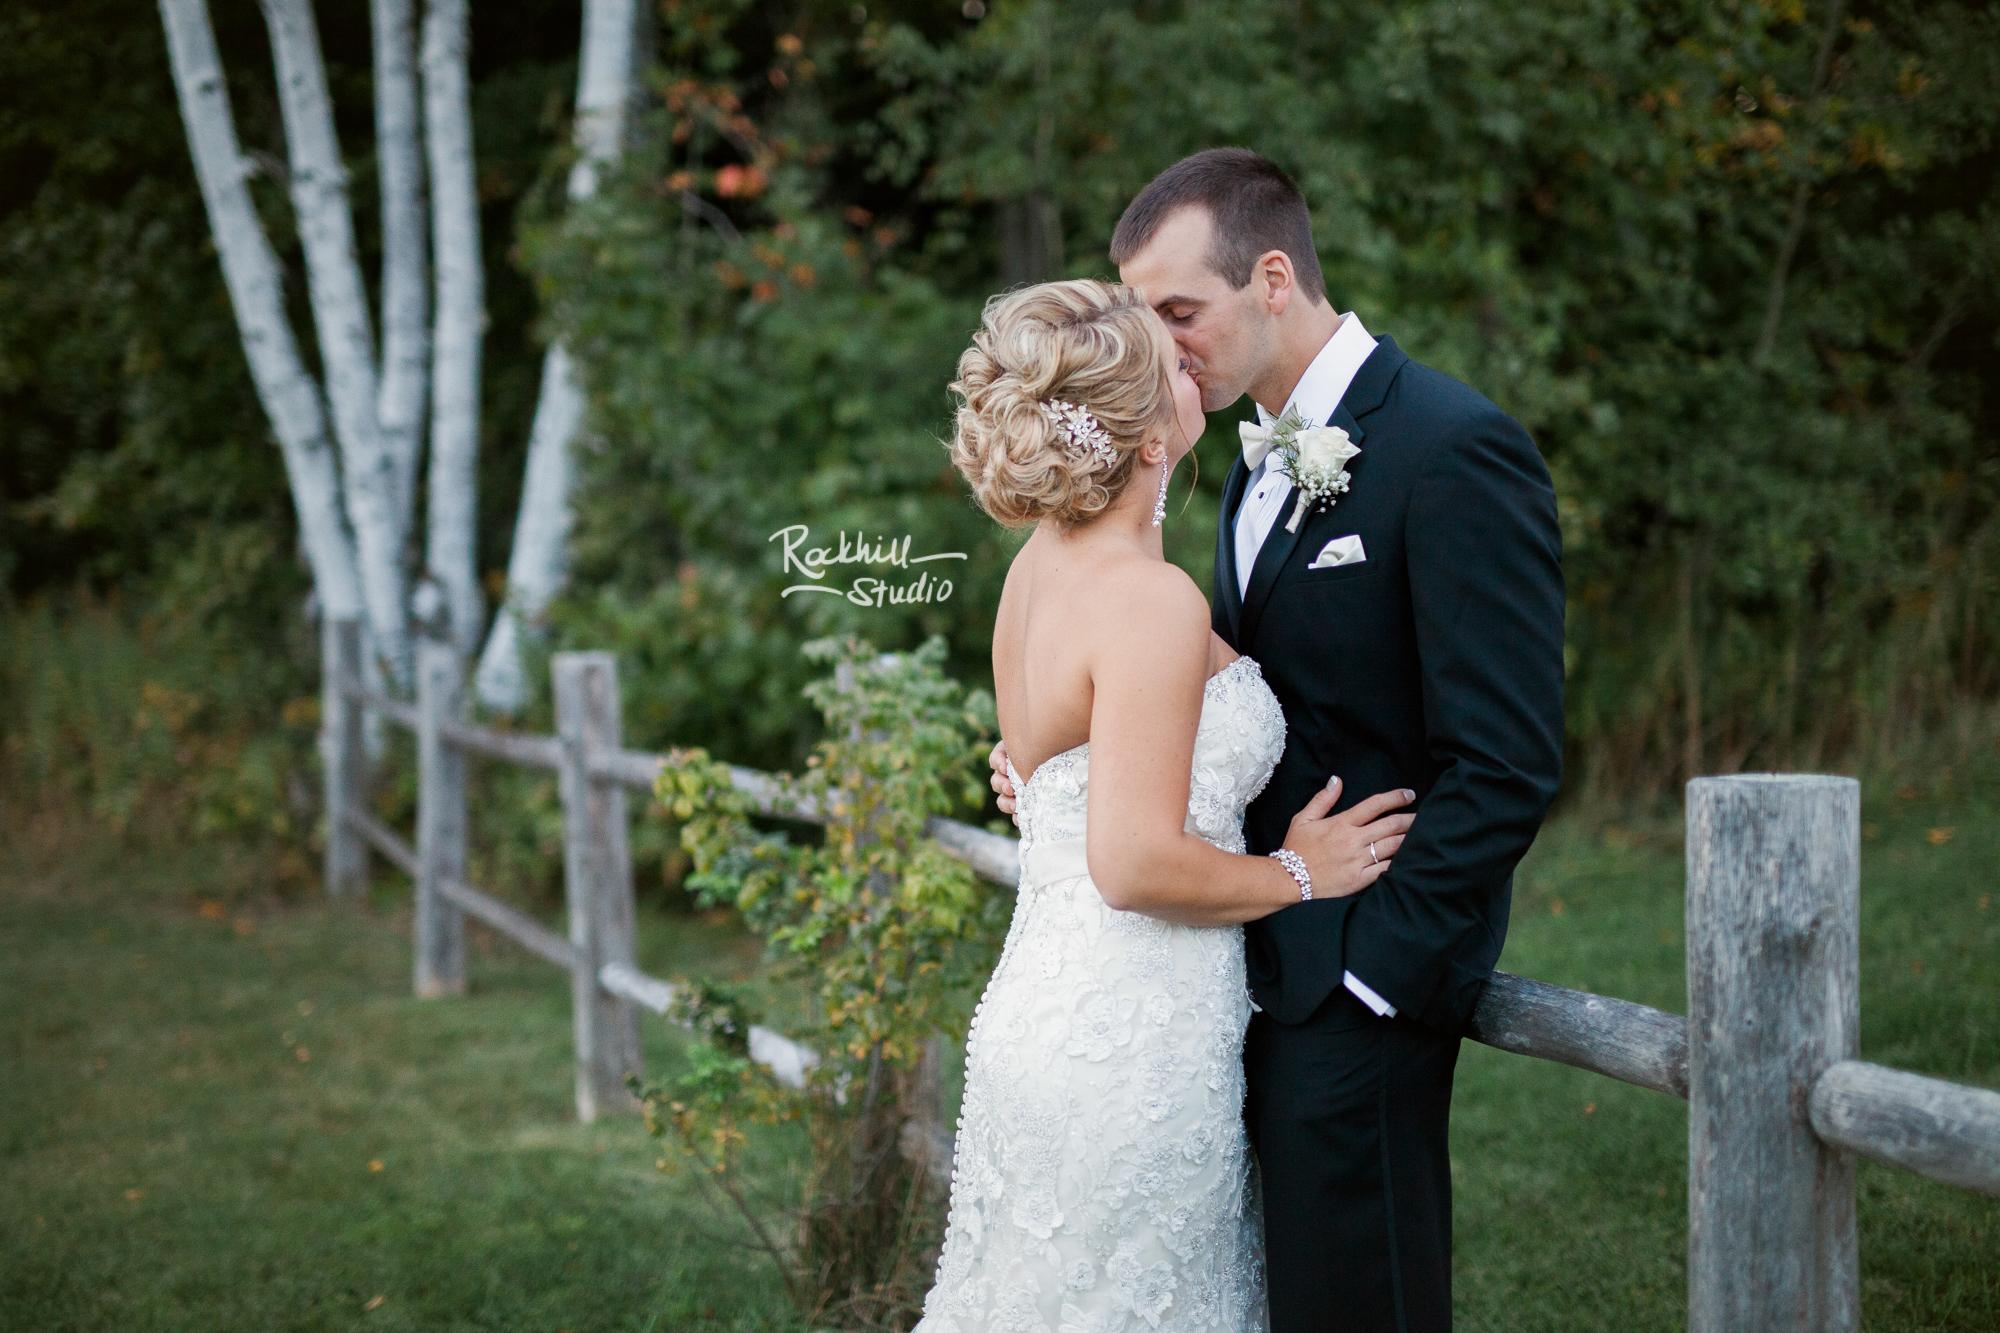 marquette-wedding-photographer-michigan-upper-peninsula-bride-groom-kissing.jpg